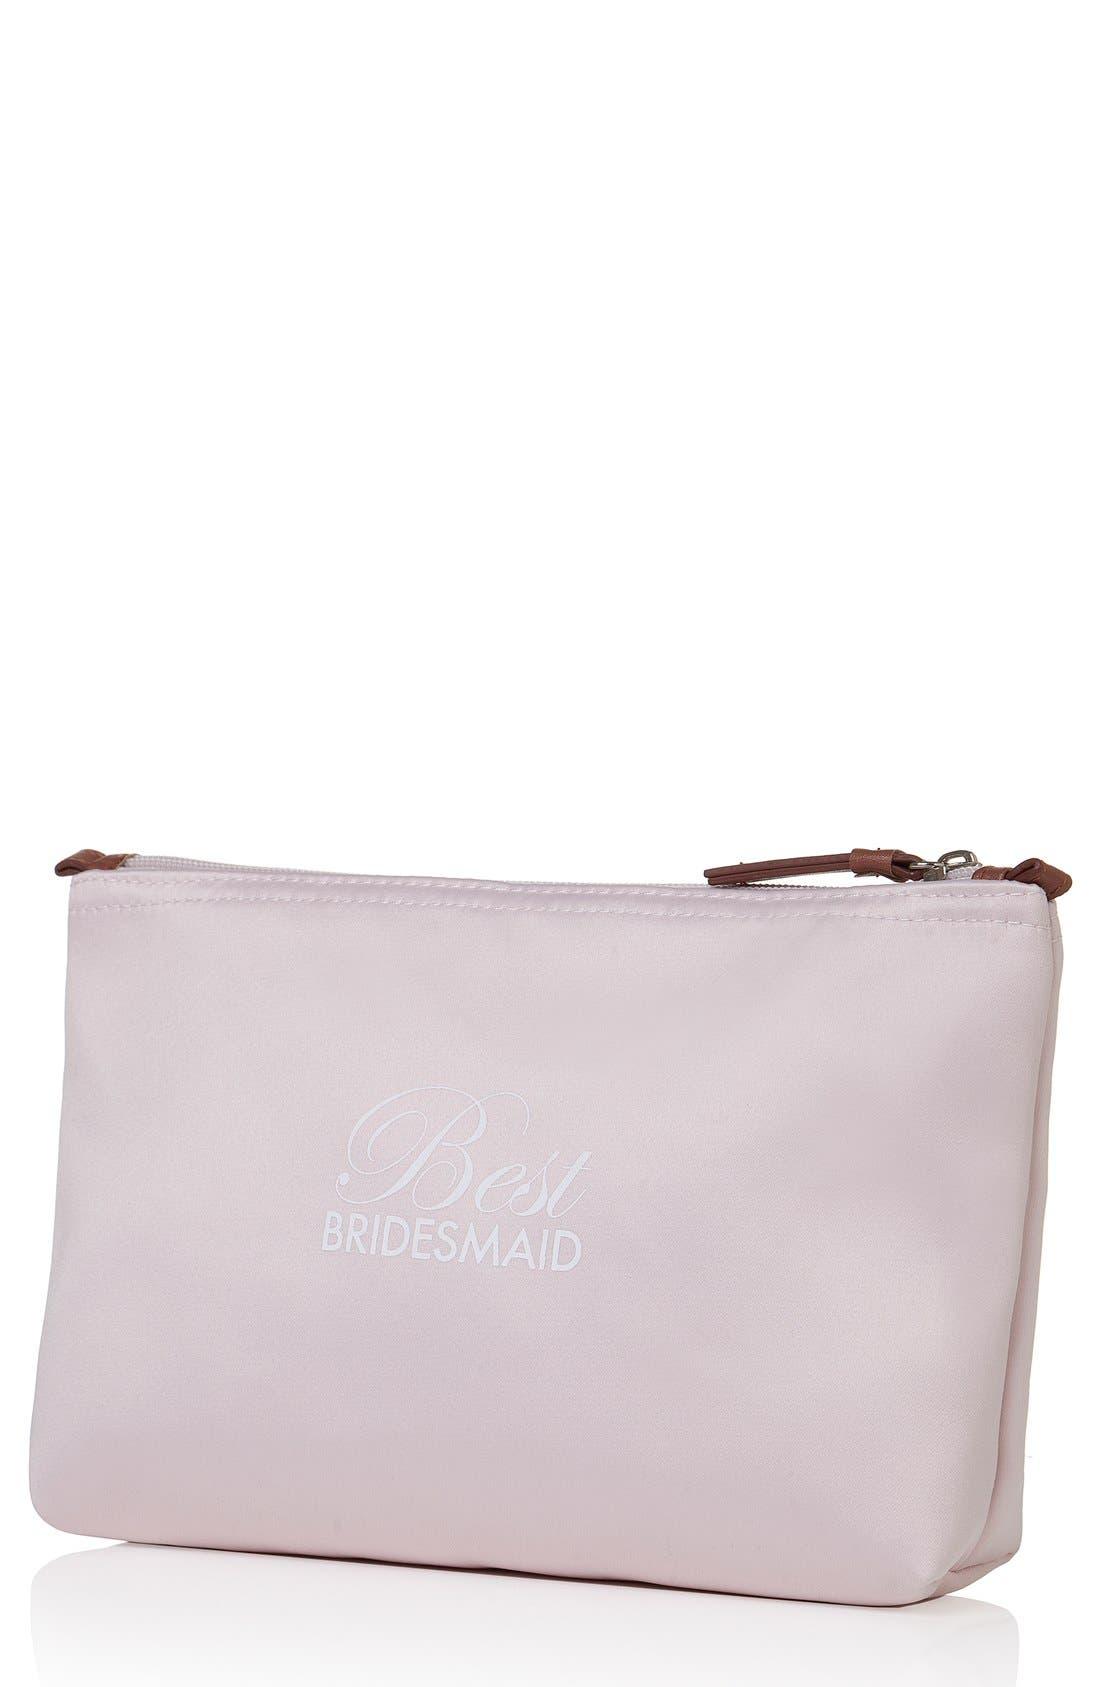 'Best Bridesmaid' Cosmetics Bag,                             Main thumbnail 1, color,                             BLUSH